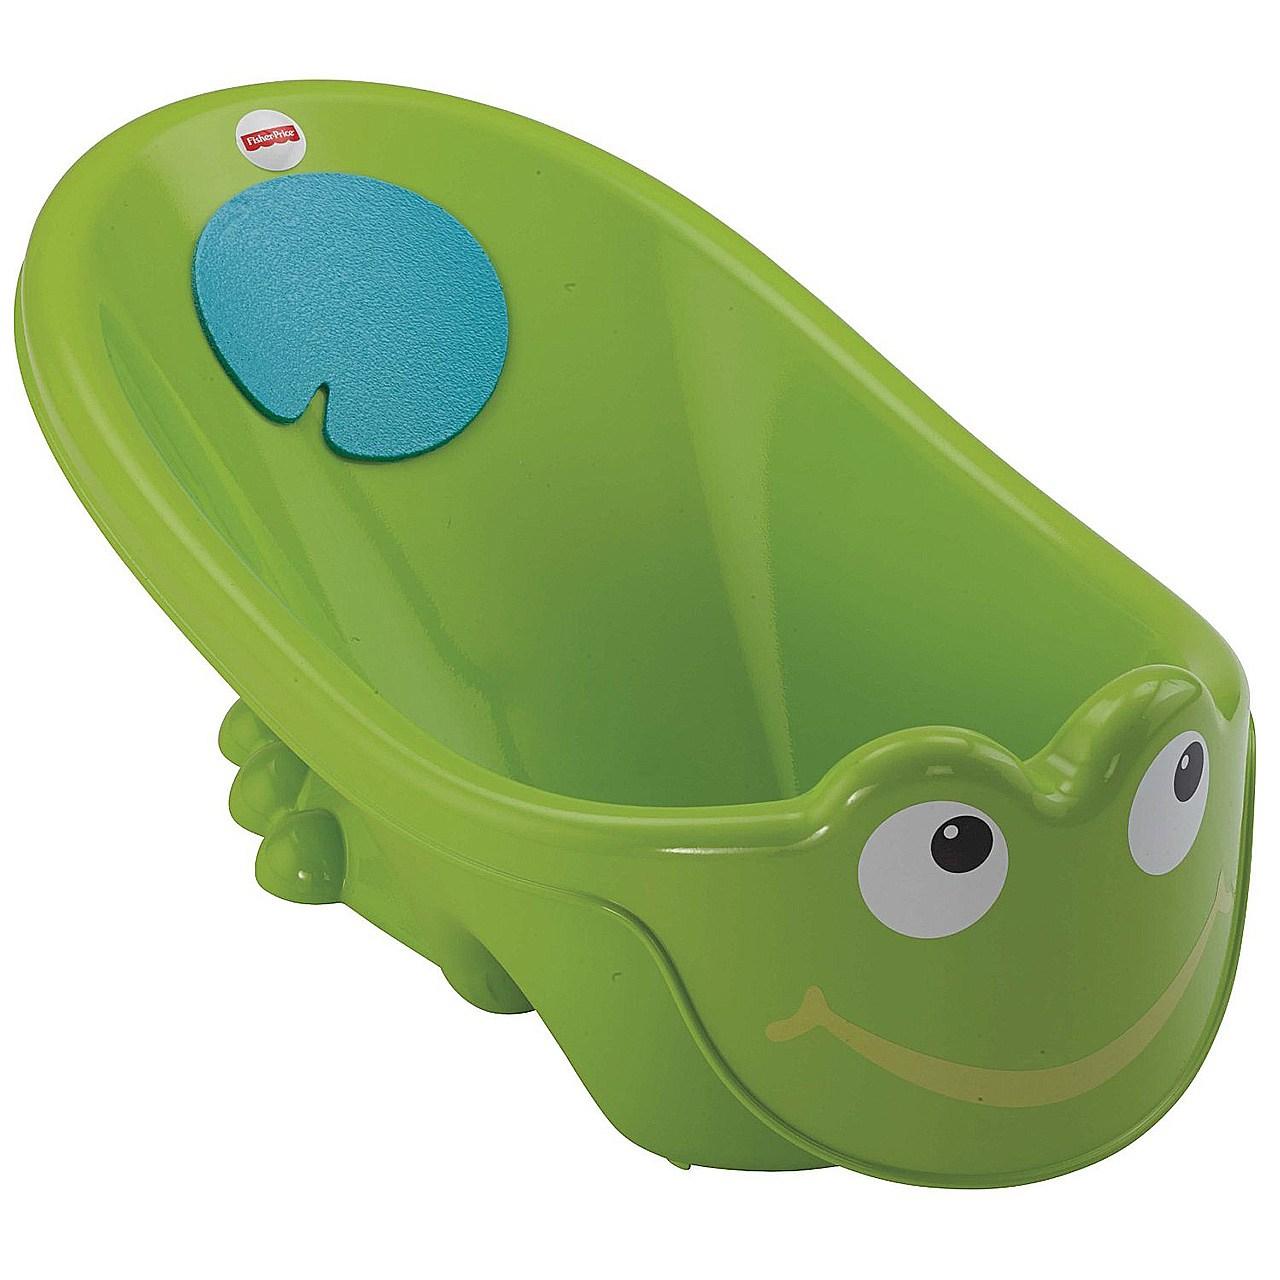 وان حمام کودک فیشر پرایس مدل Todpole